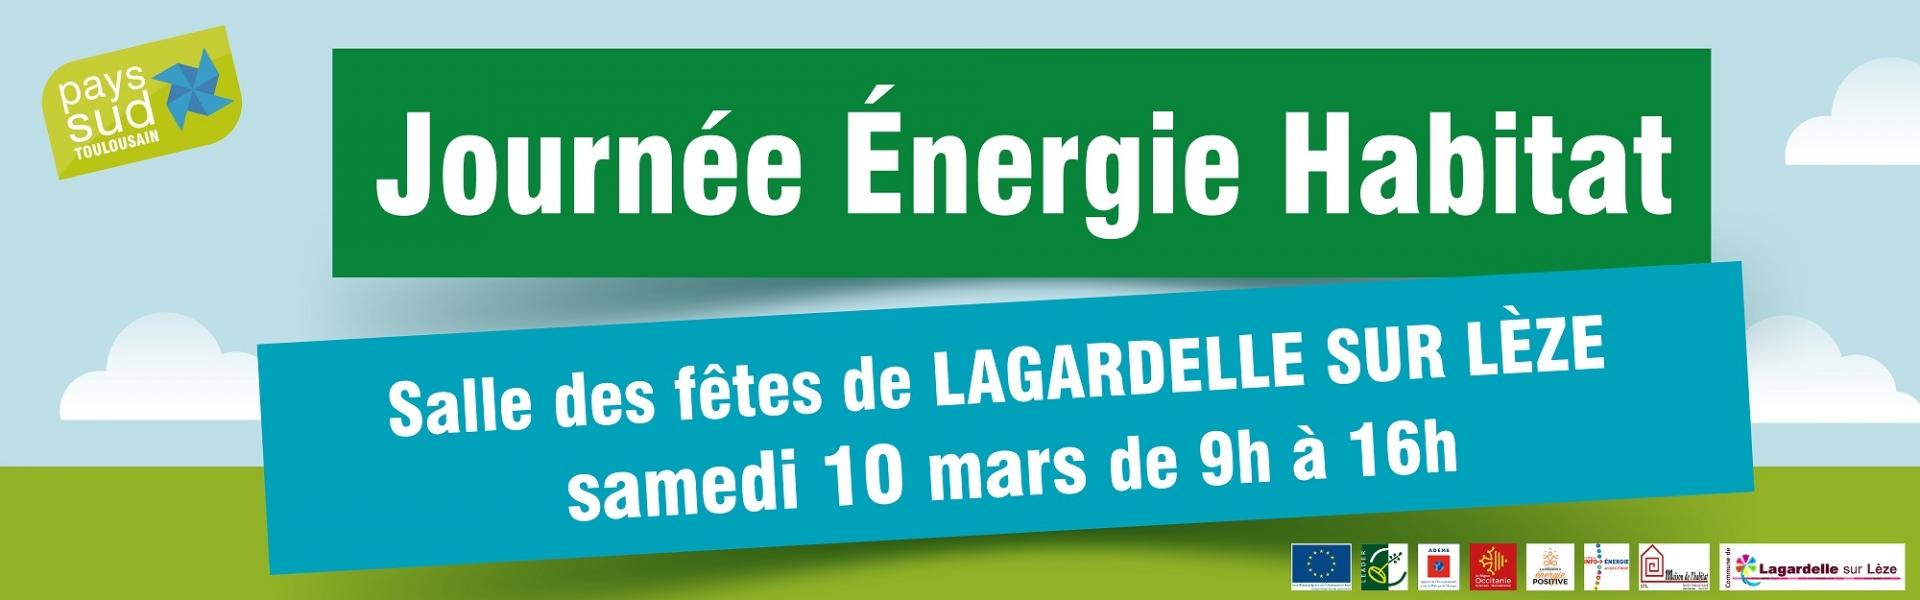 Journée énergie habitat Lagardelle sur Lèze